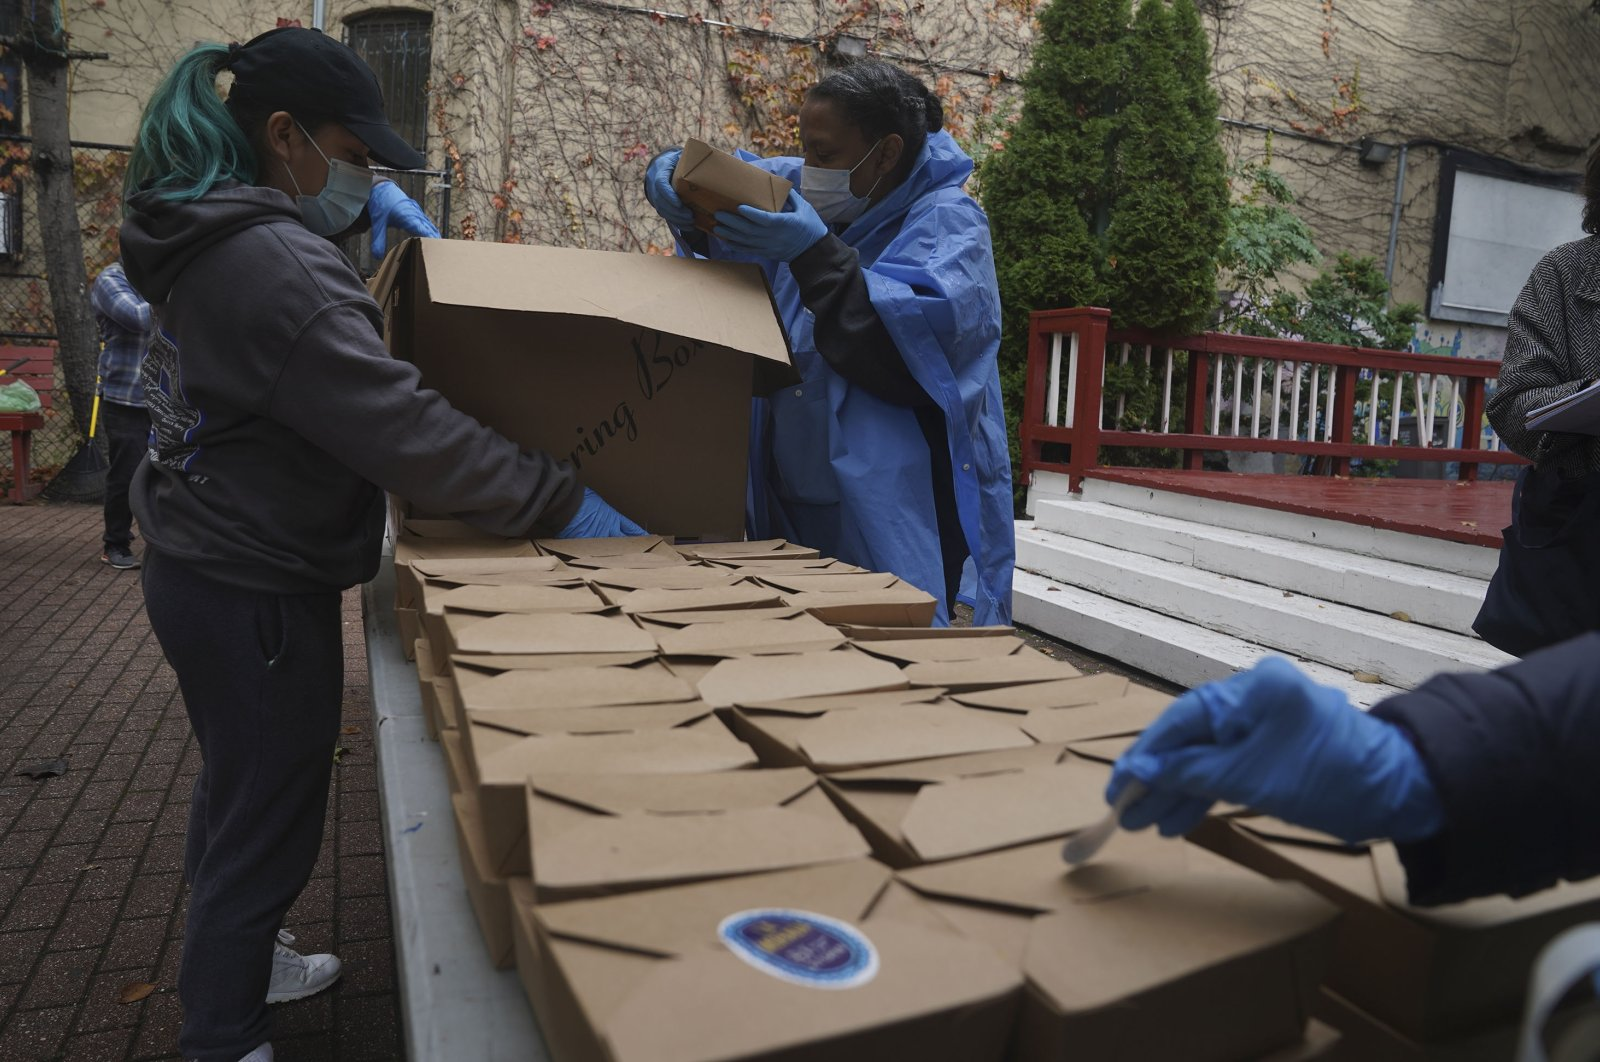 Volunteers unload boxed meals prepared at the South Bronx restaurant La Morada, in New York City, New York, U.S., Oct. 28, 2020. (AP Photo)